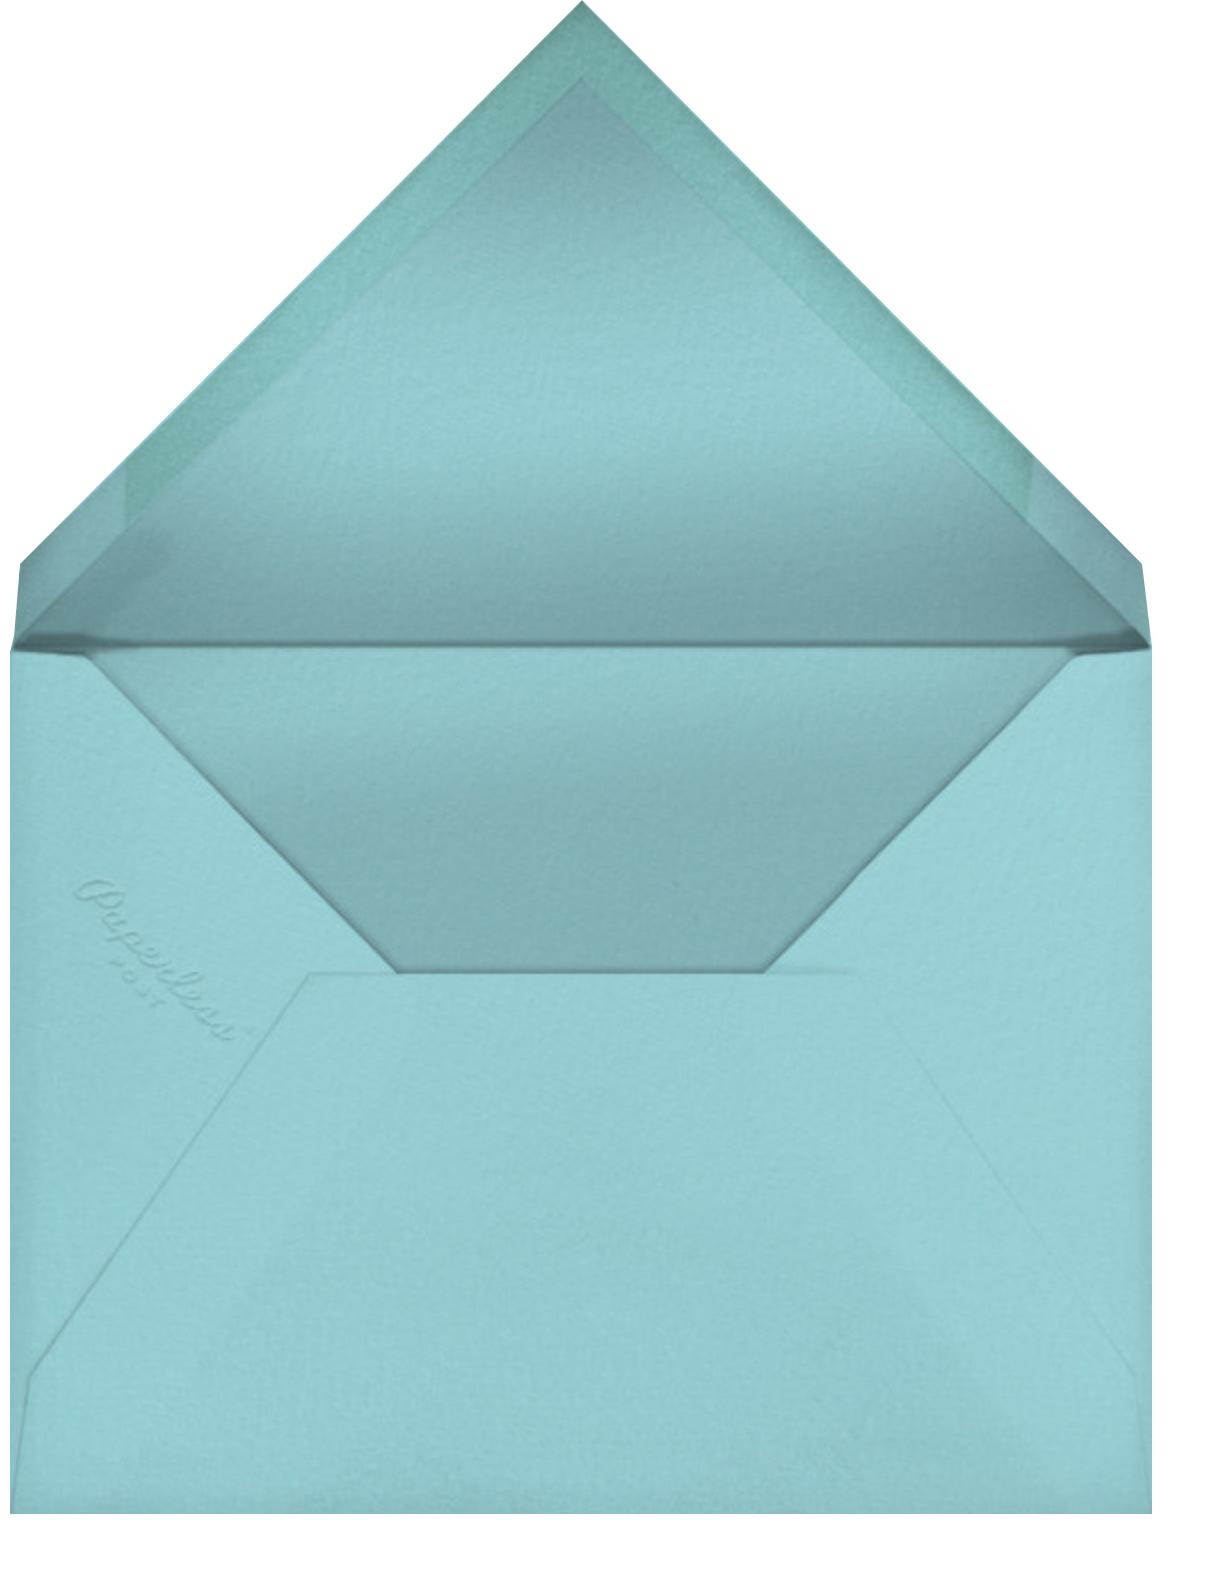 Wingspan - Meri Meri - Woodland baby shower - envelope back